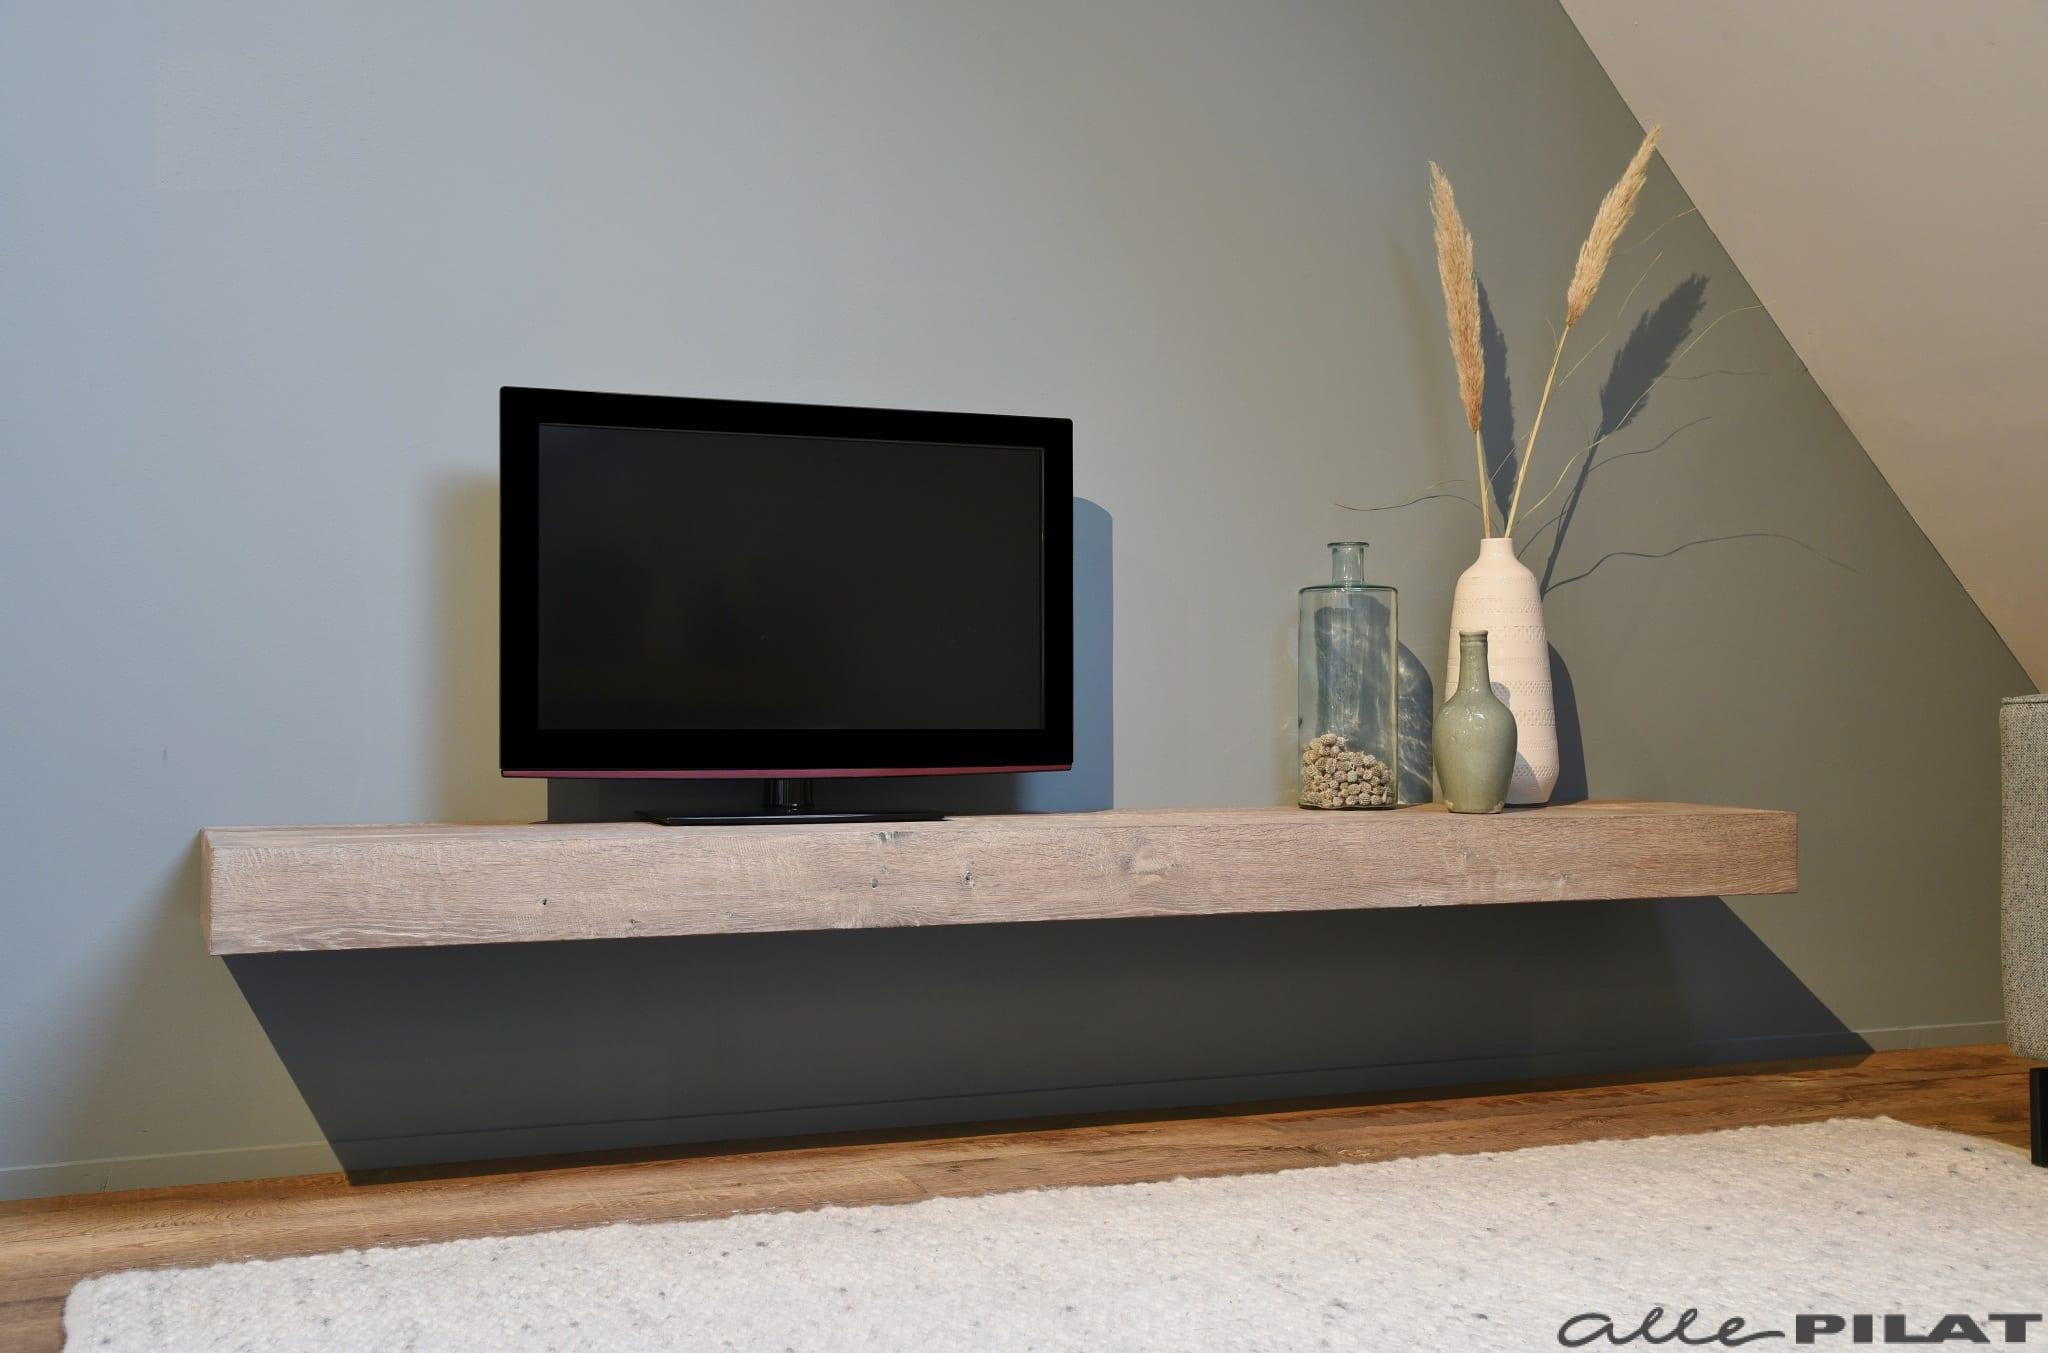 Tv Meubel Plank.Tv Meubel Plank Hangend Wandmeubel Eikenhout Woonwinkel Alle Pilat